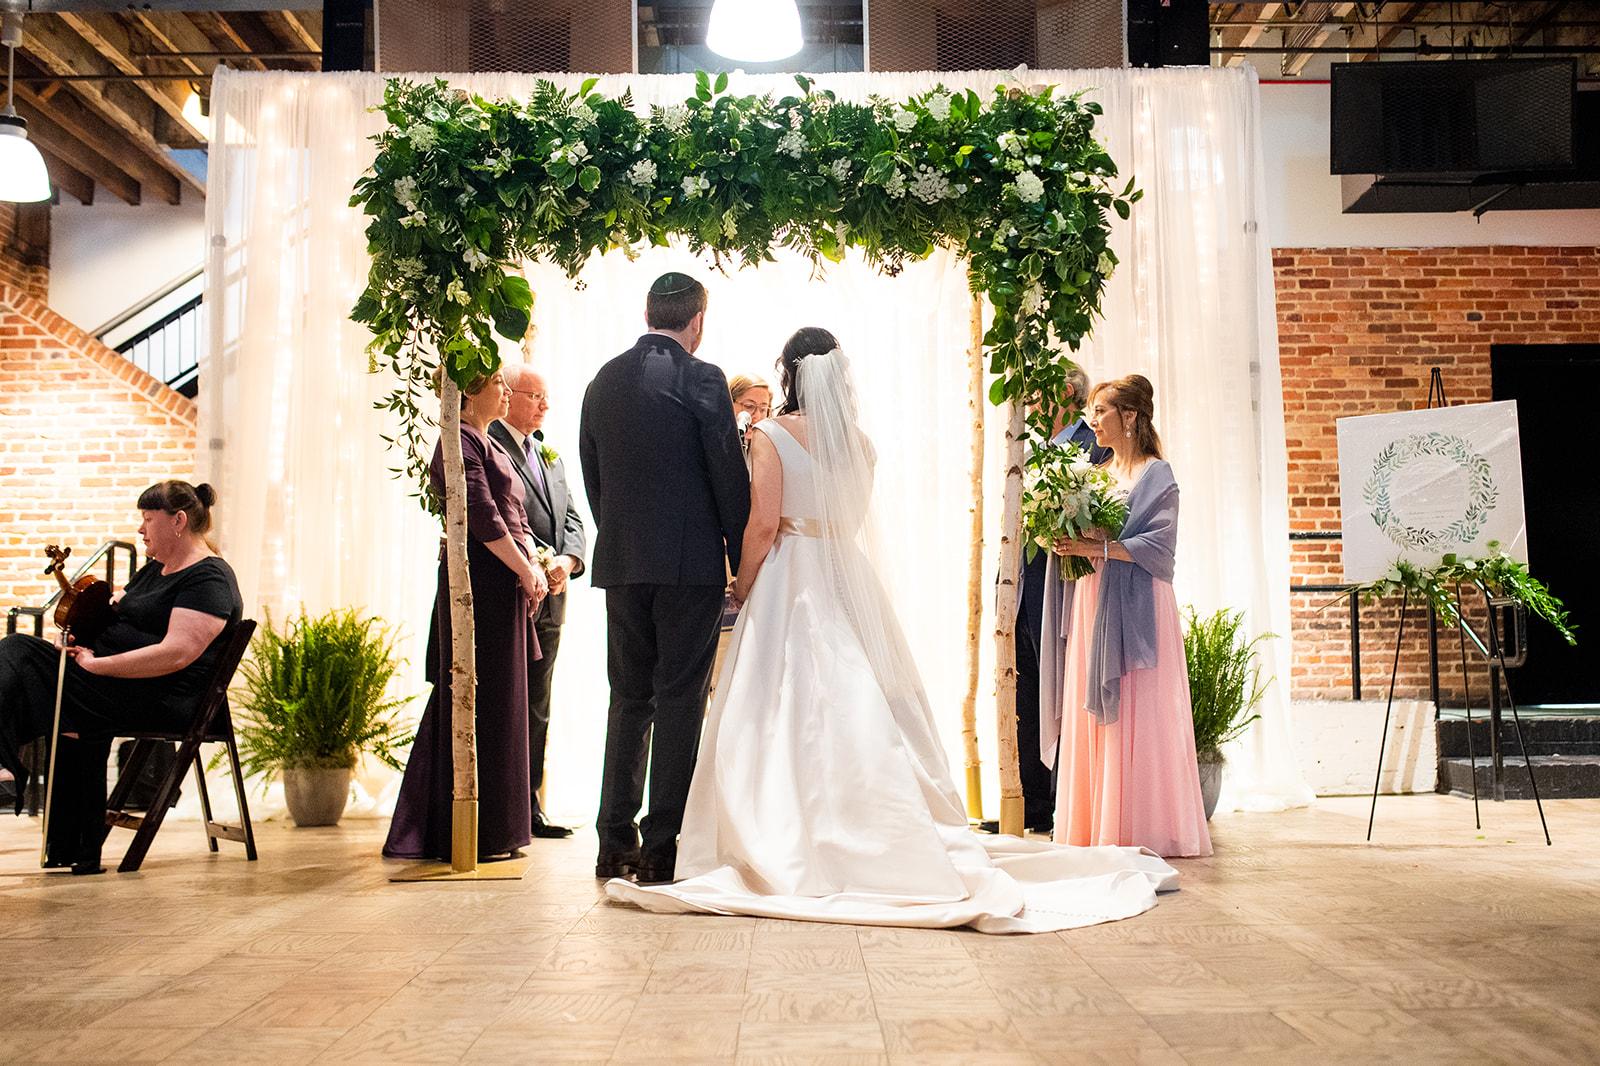 The_best_of_the_best_wedding_photographer_Mantas_Kubilinskas-462.jpg